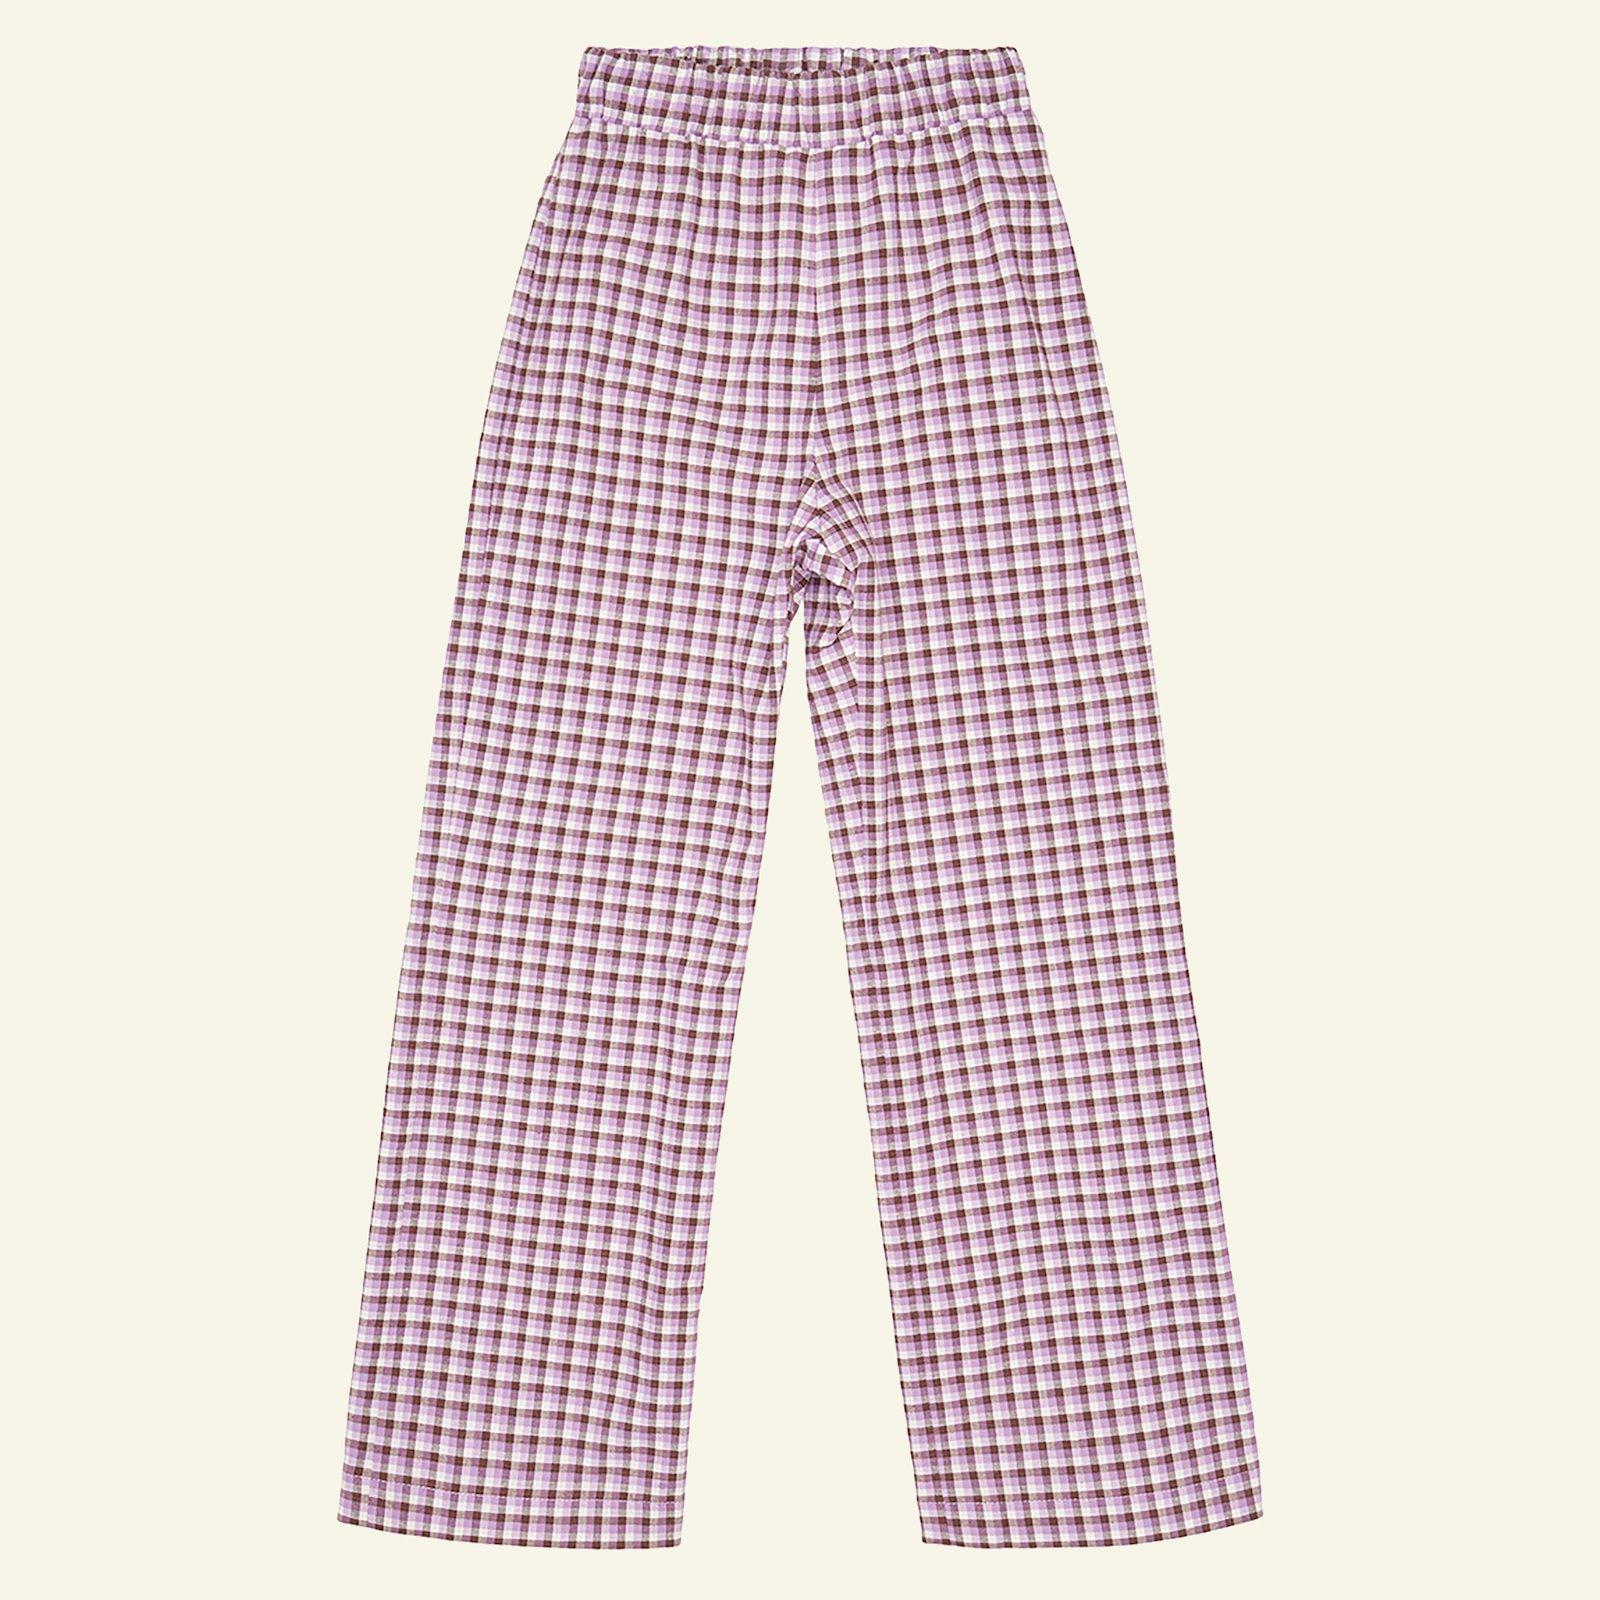 High waist and wide lege trouser, 152/12 p60034_501795_sskit